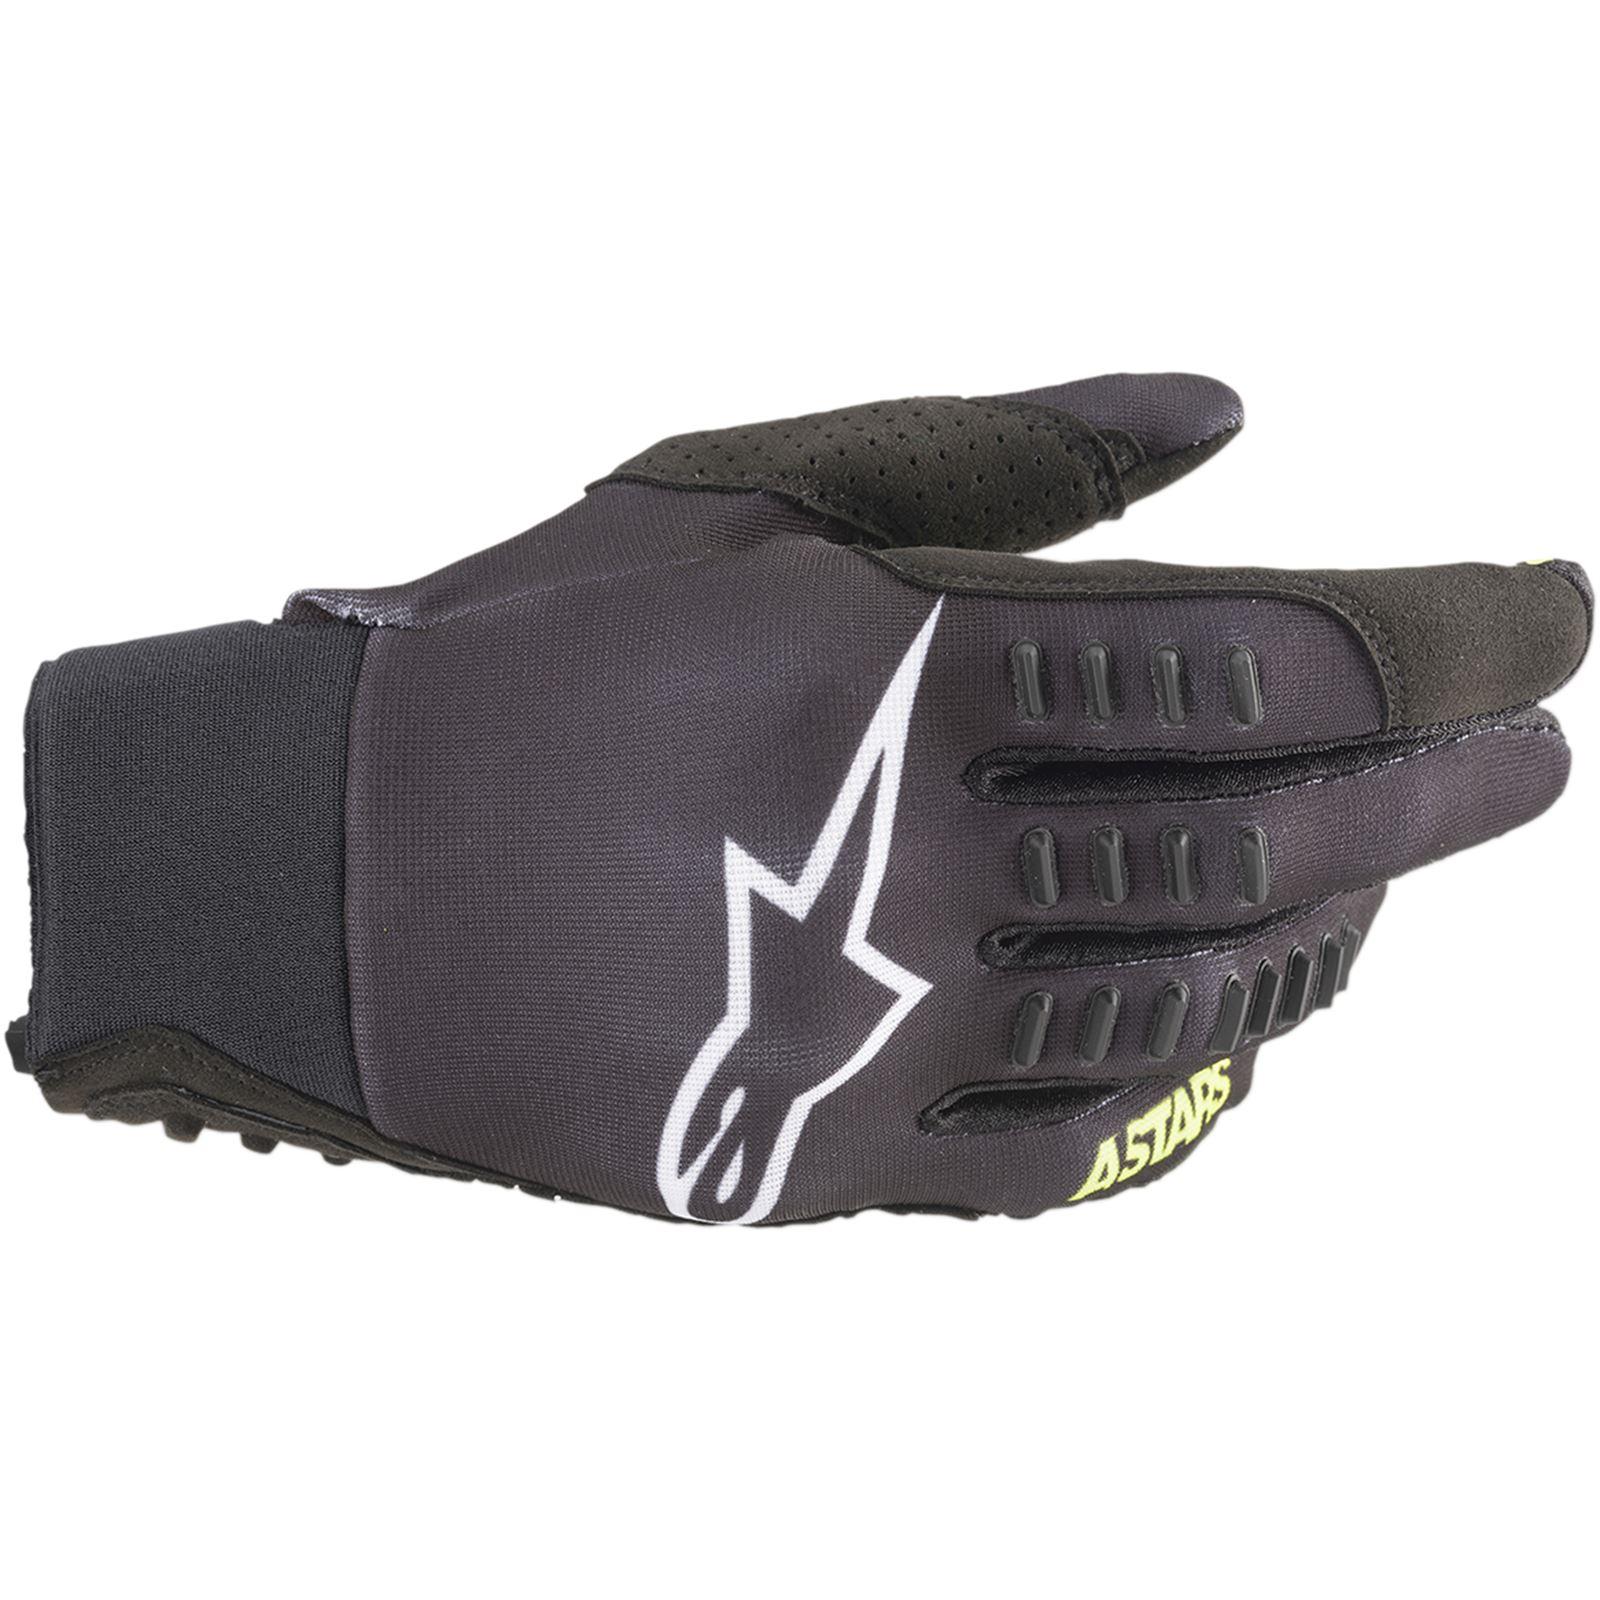 Alpinestars SMX-E Gloves - Black/Yellow - 2X-Large